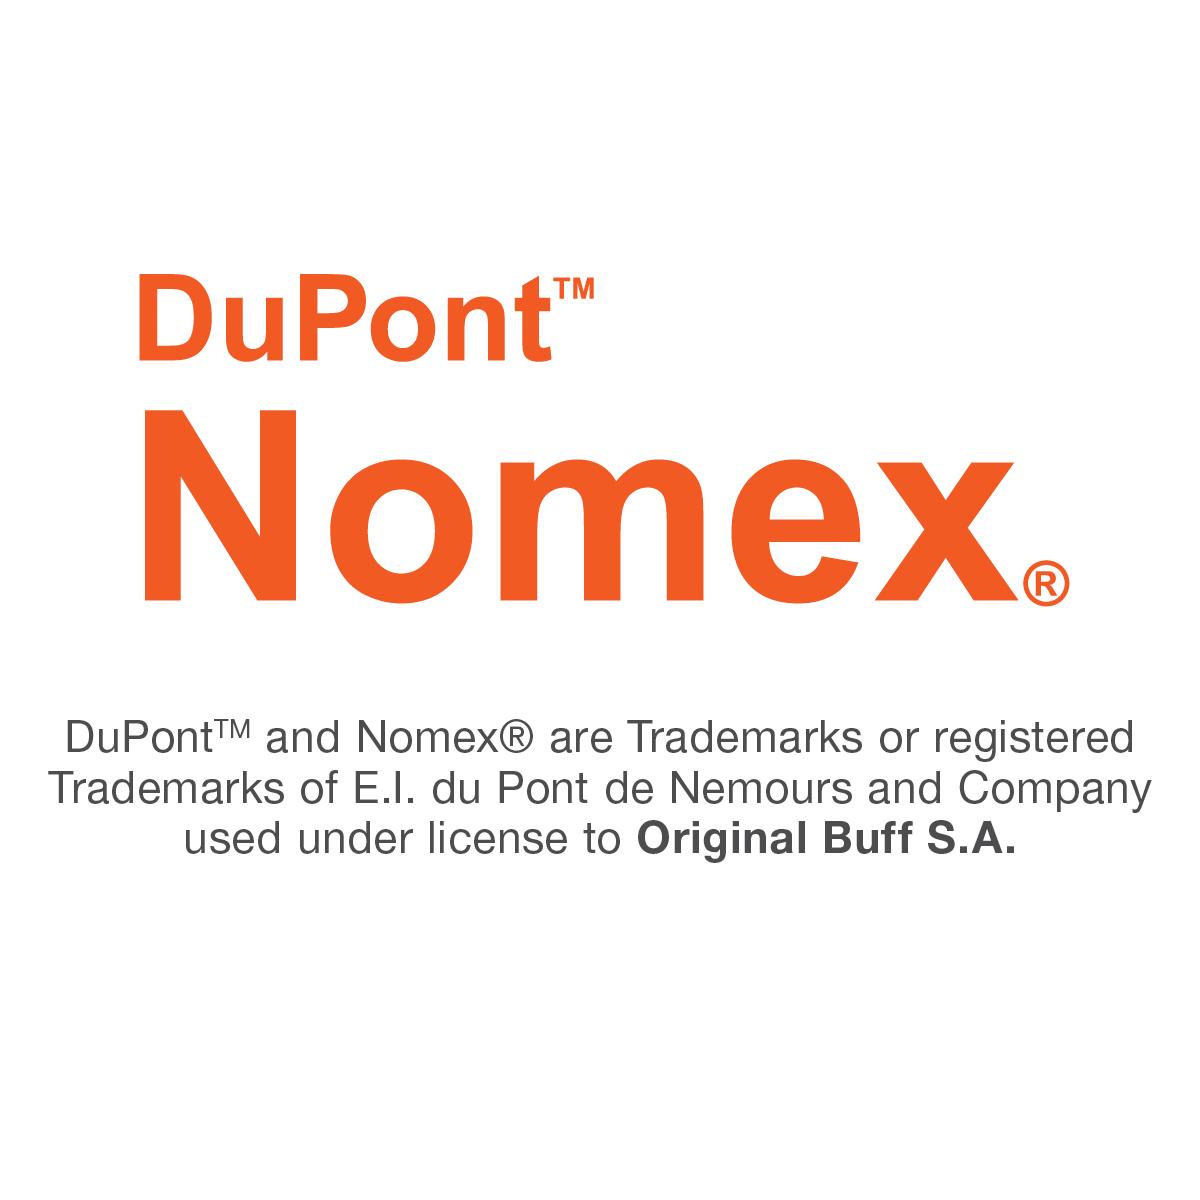 BUFF DUPONT NOMEX